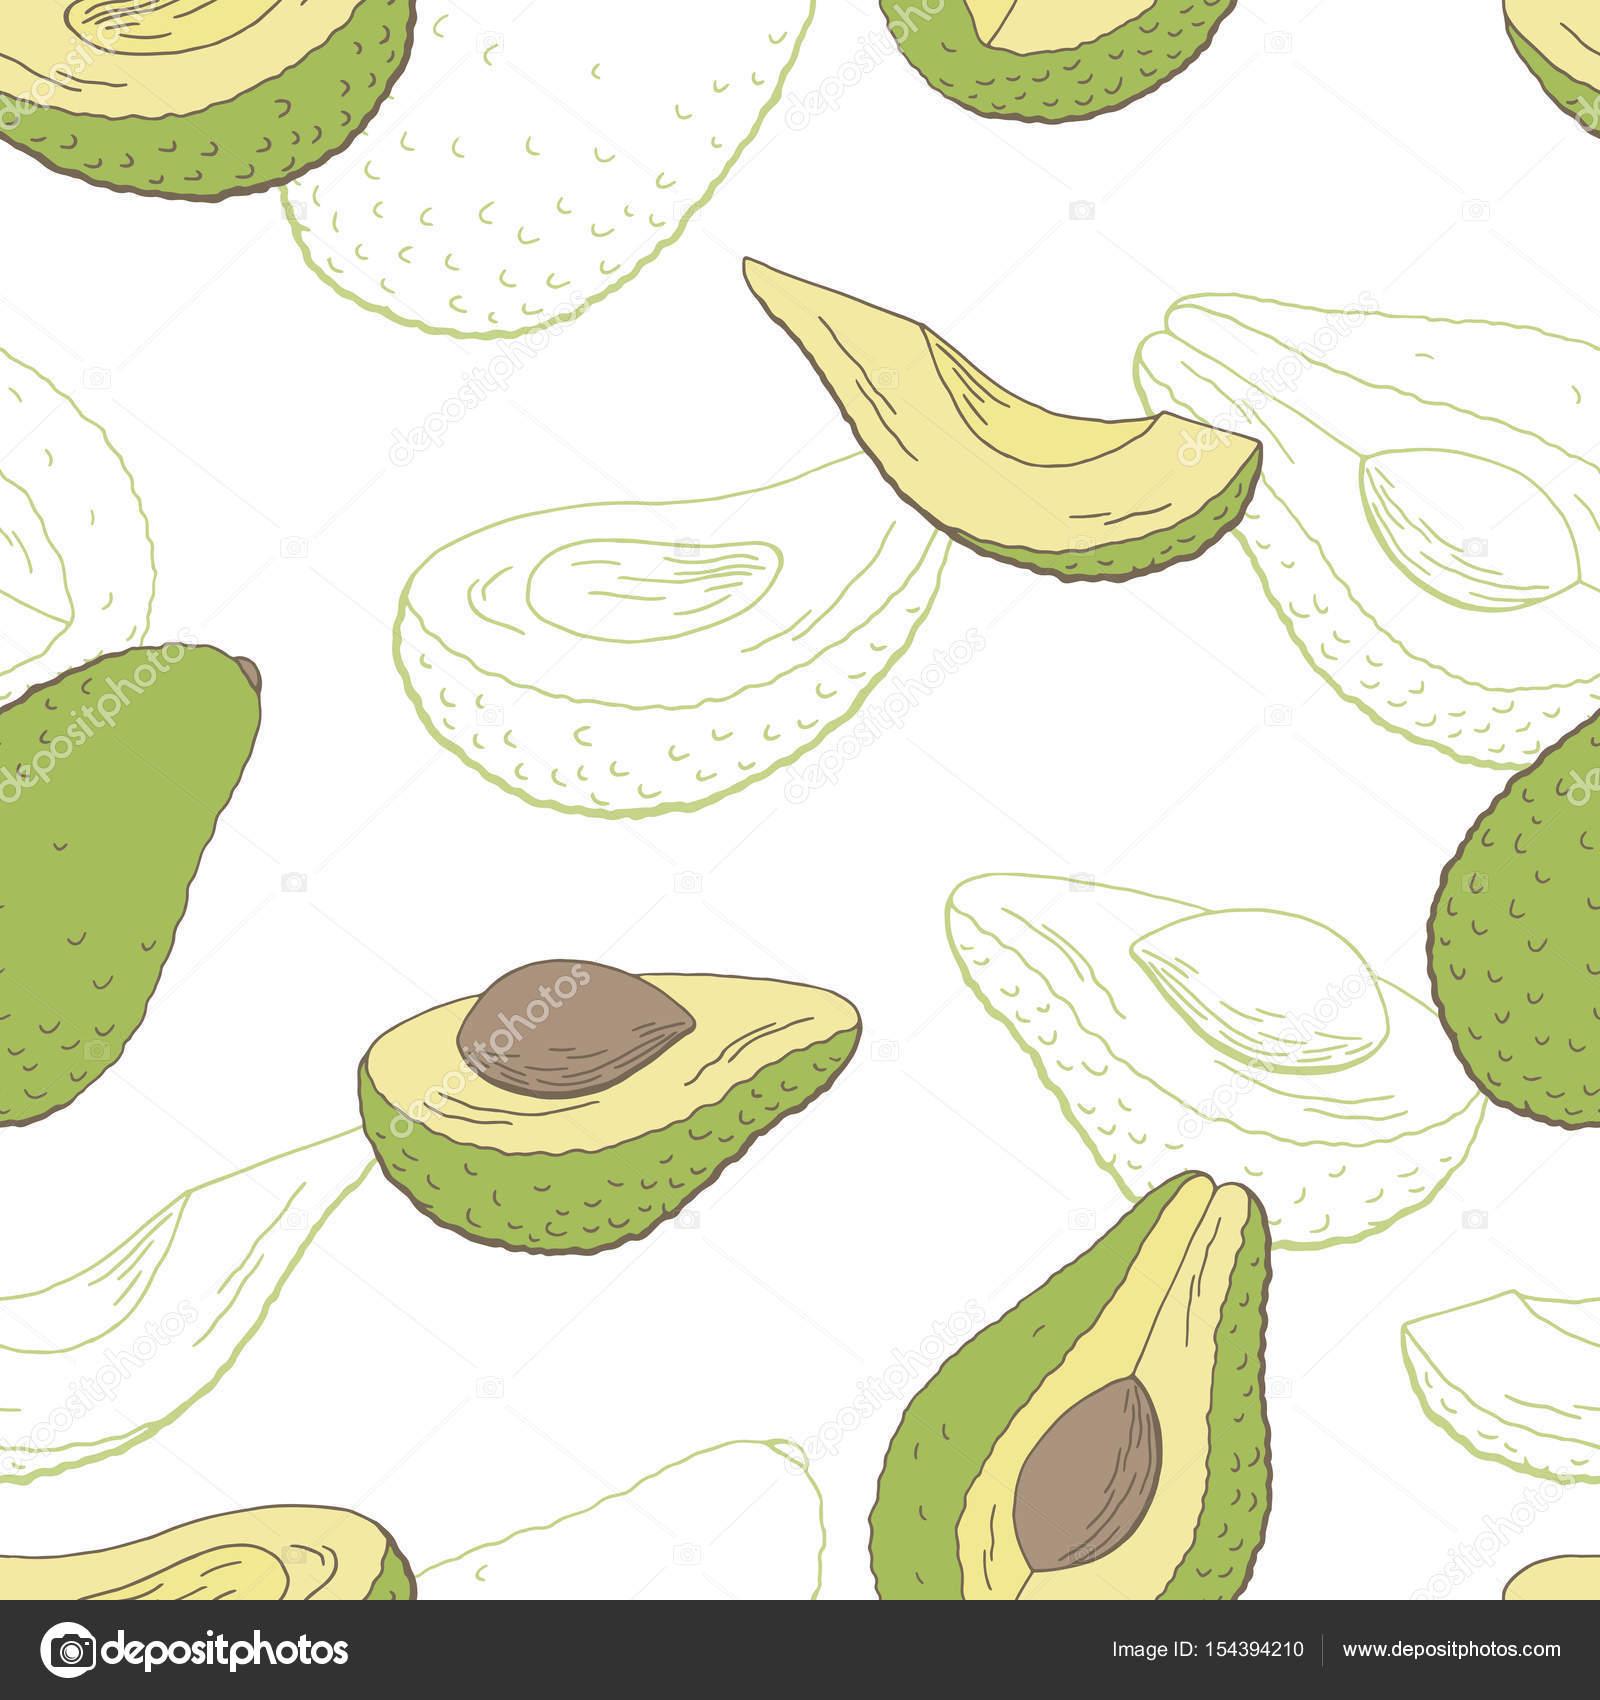 Avocado-Frucht Grafik Farbe Musterdesign Skizze Abbildung Vektor ...